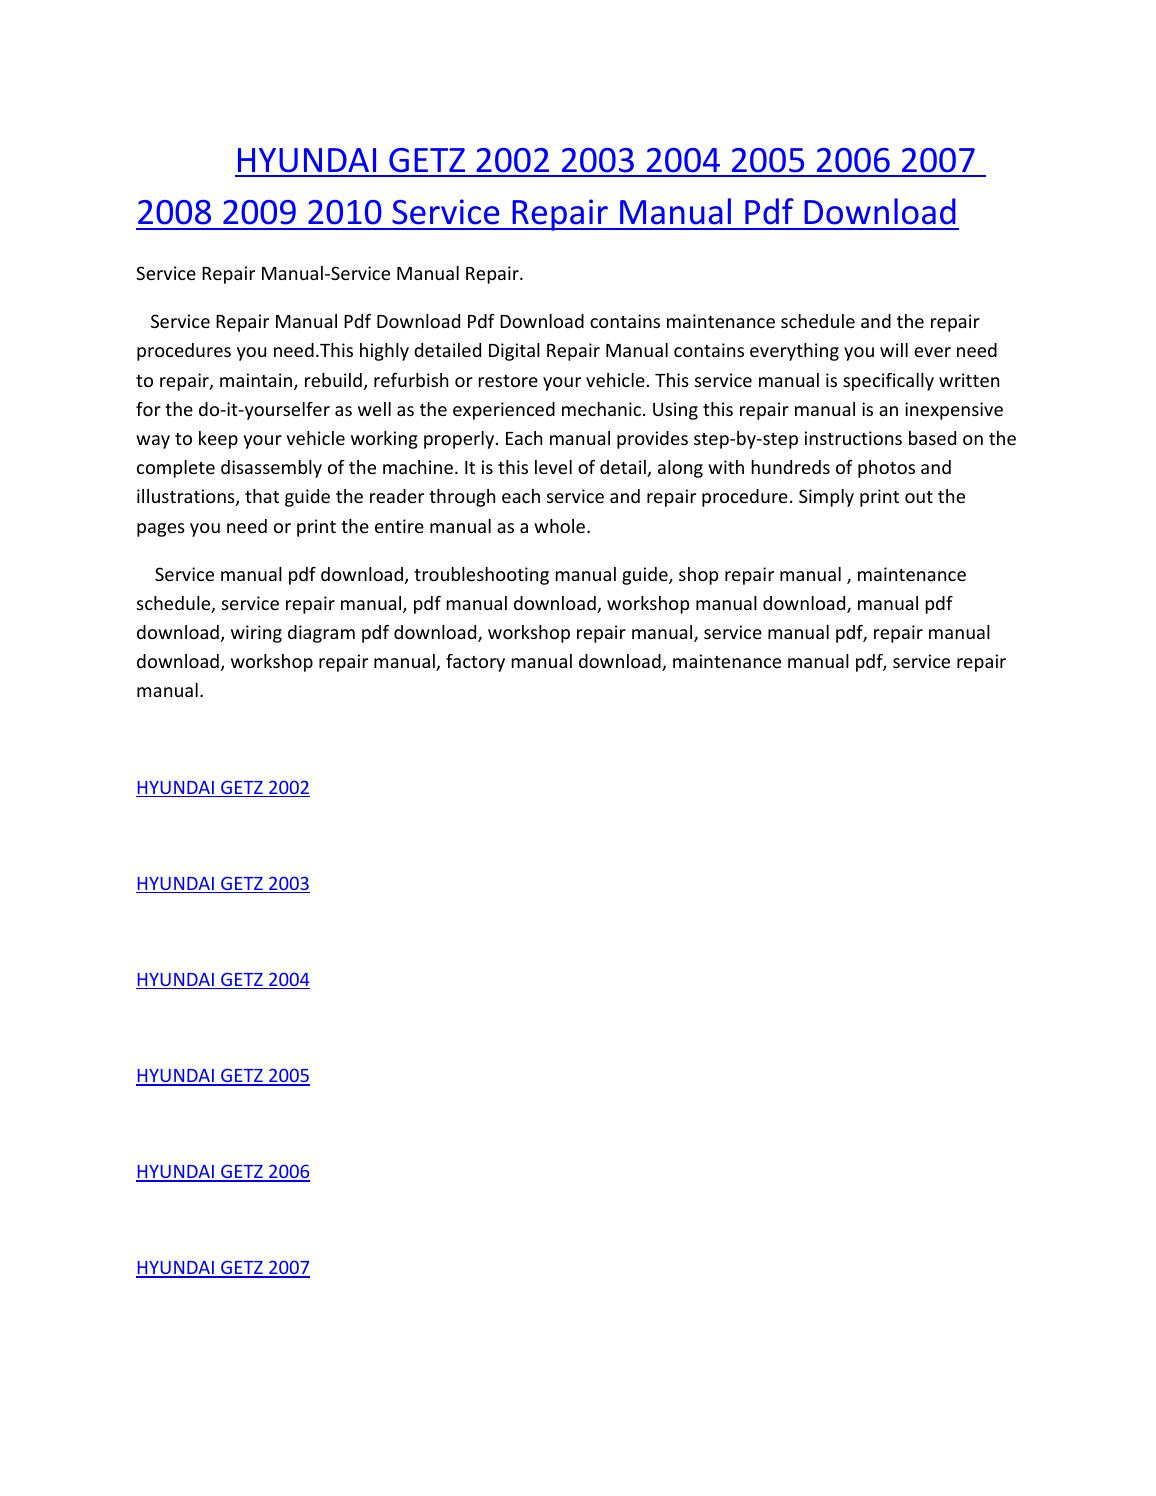 hight resolution of hyundai getz 2002 2003 2004 2005 2006 2007 2008 2009 2010 service manual repair pdf download